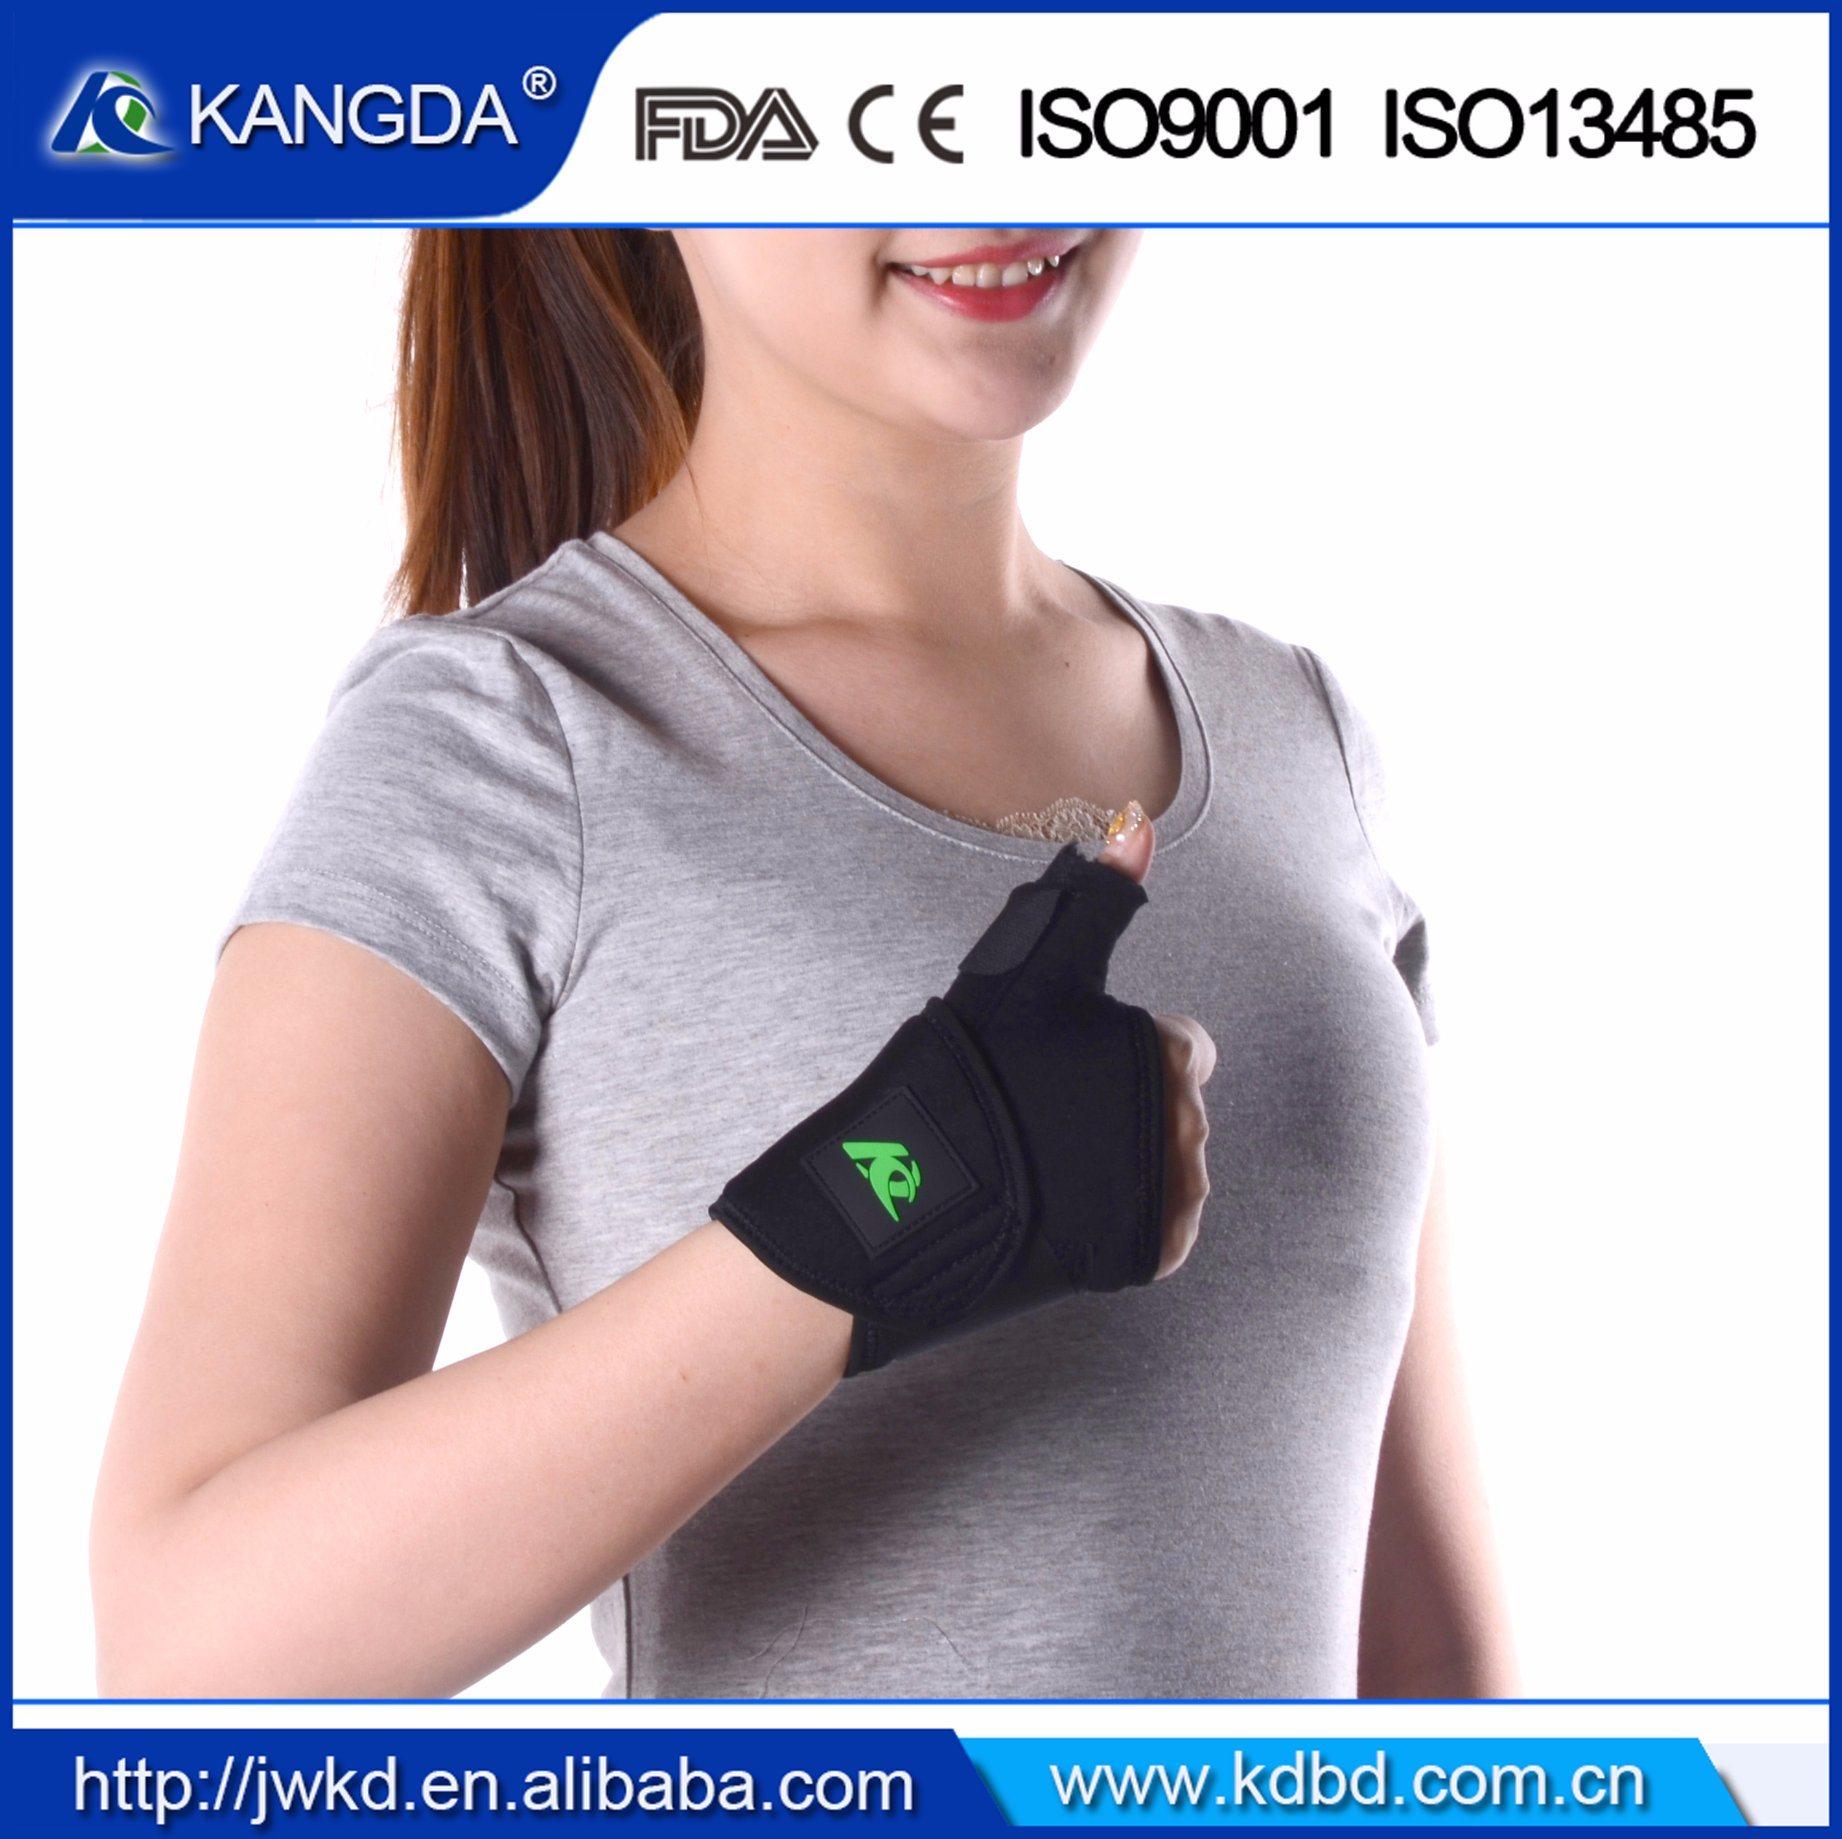 Thumb Finger Elastic Support Splint Brace Band Strap Belt